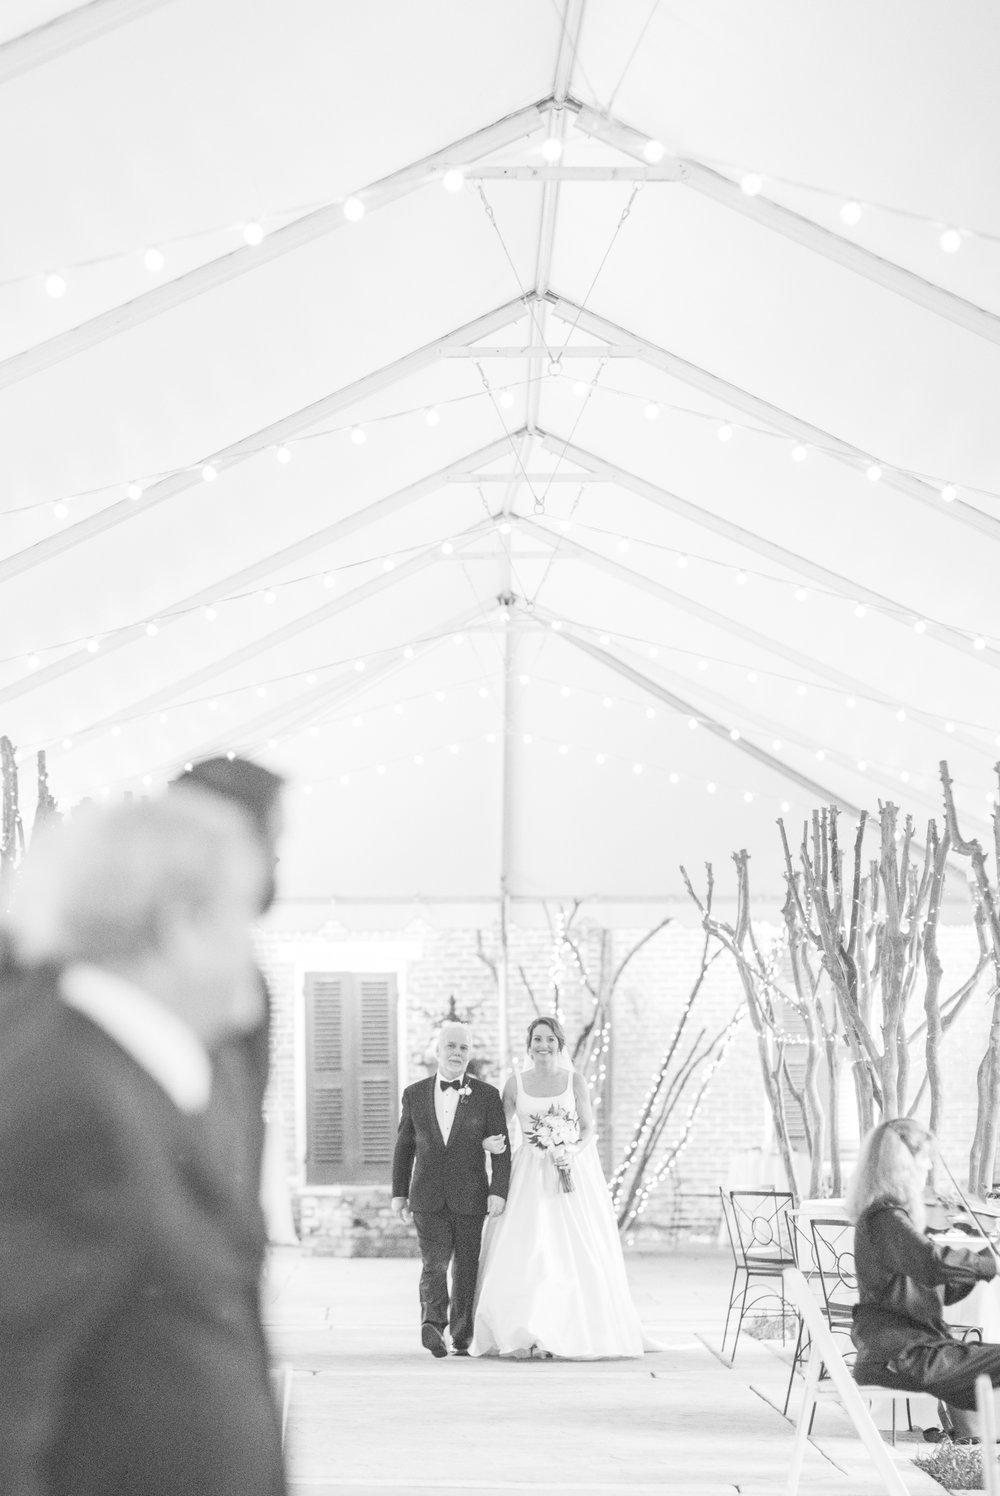 memphis-wedding-hunt-phelan 41.jpg